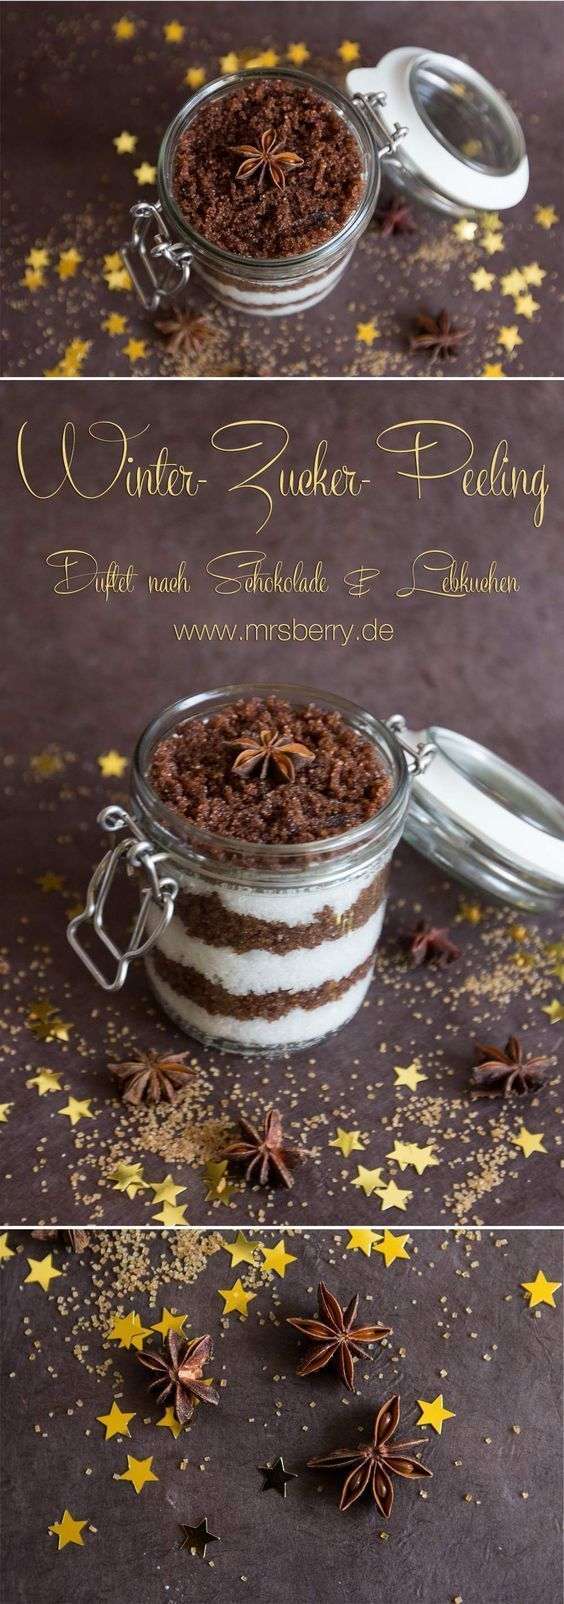 Make exfoliation yourself: Winter sugar peeling  -  Hautpflege-Rezepte